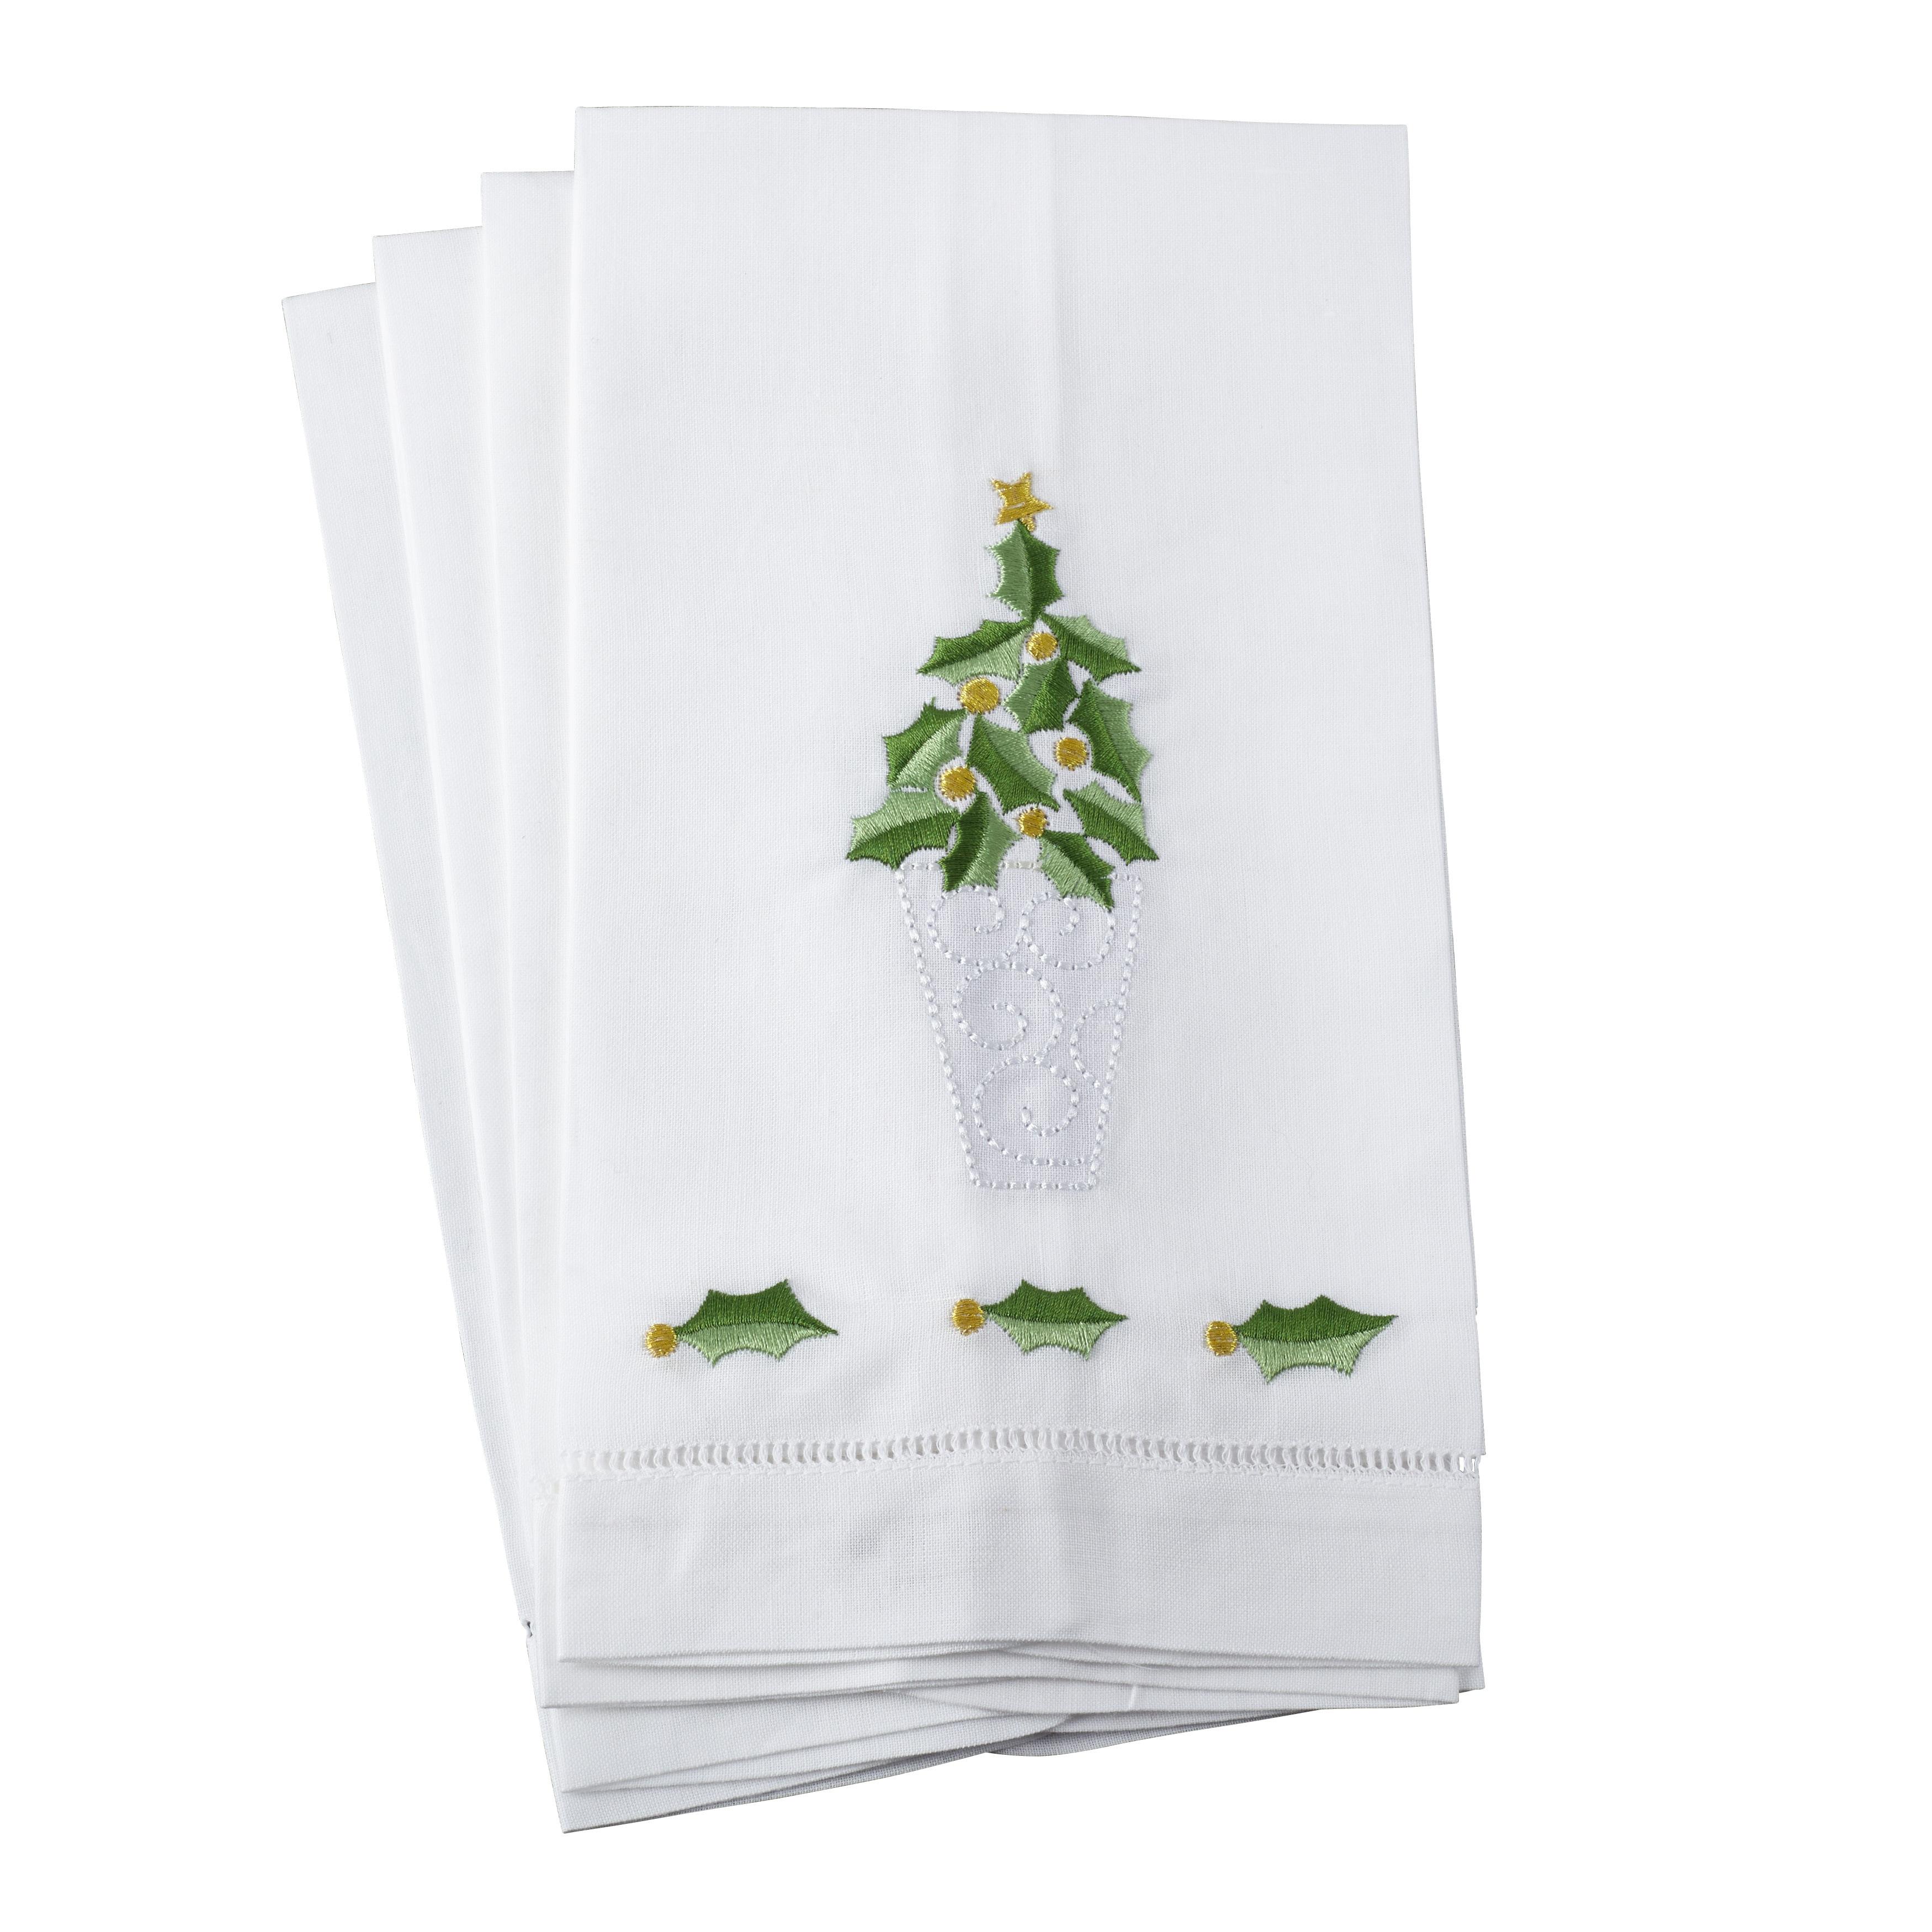 Saro Embroidered Holly Leaf Christmas Tree Design Hemstit...